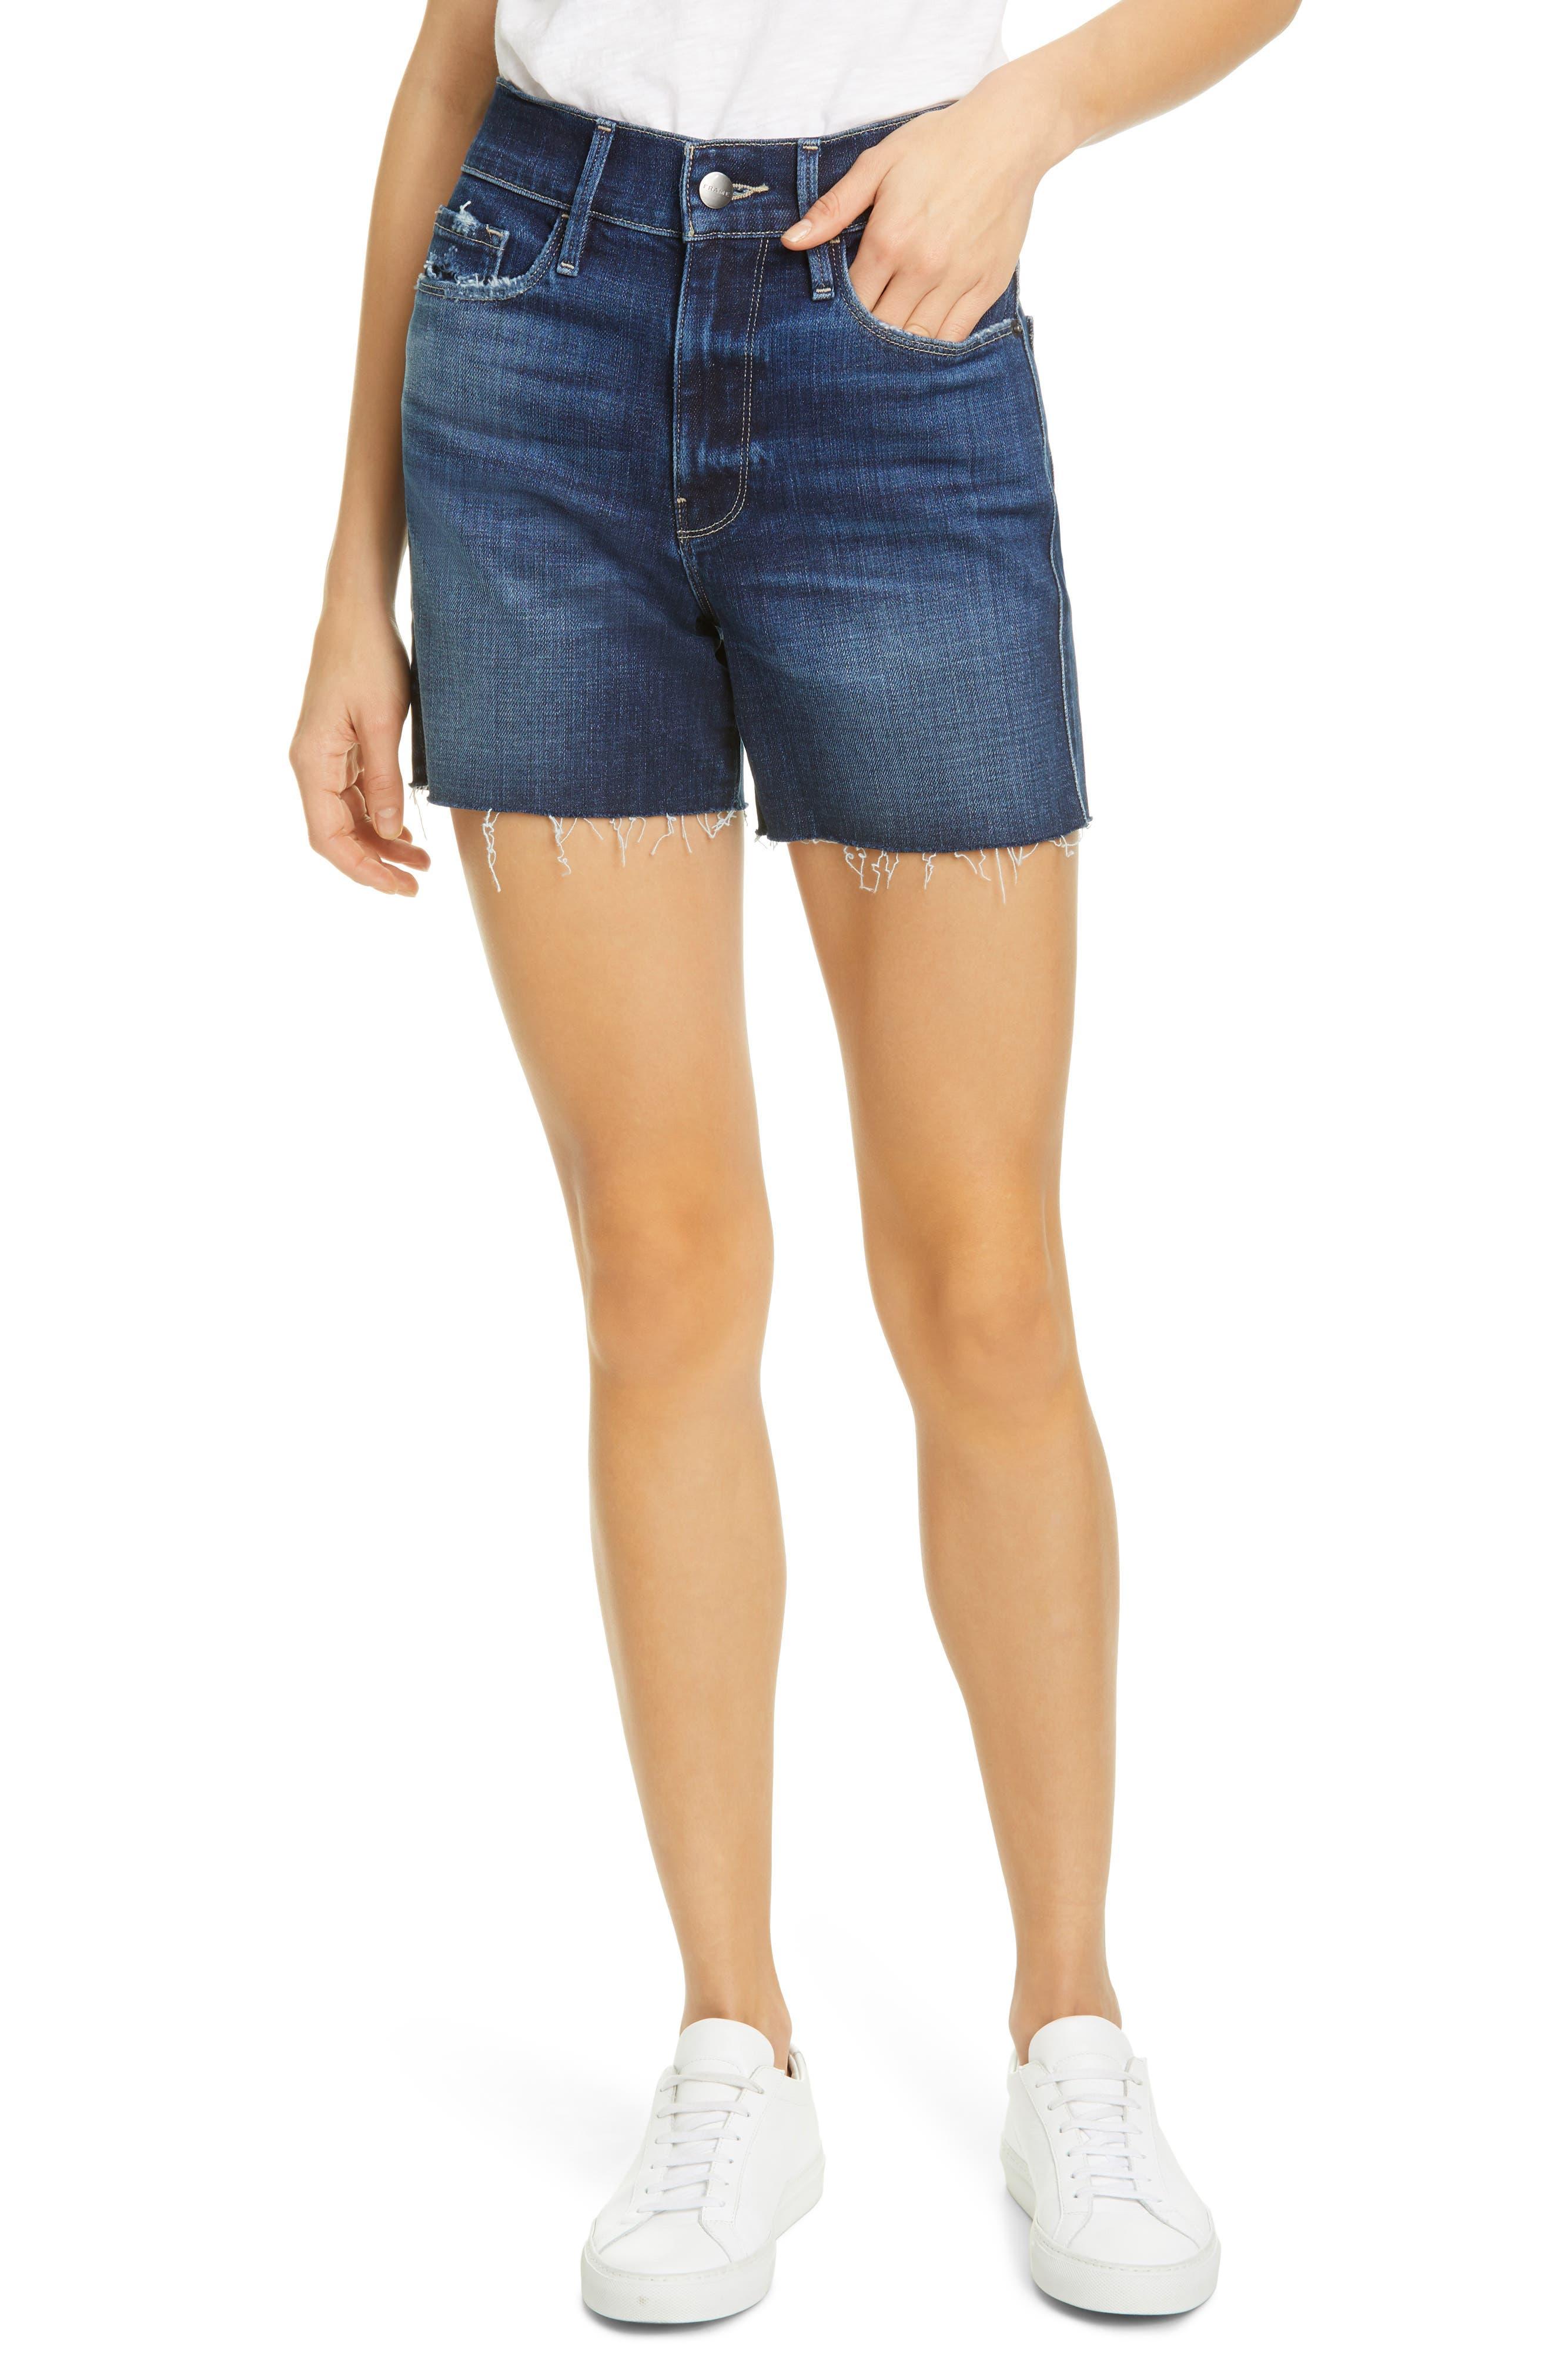 Women's Frame Le Tour High Waist Denim Shorts,  32 - Blue